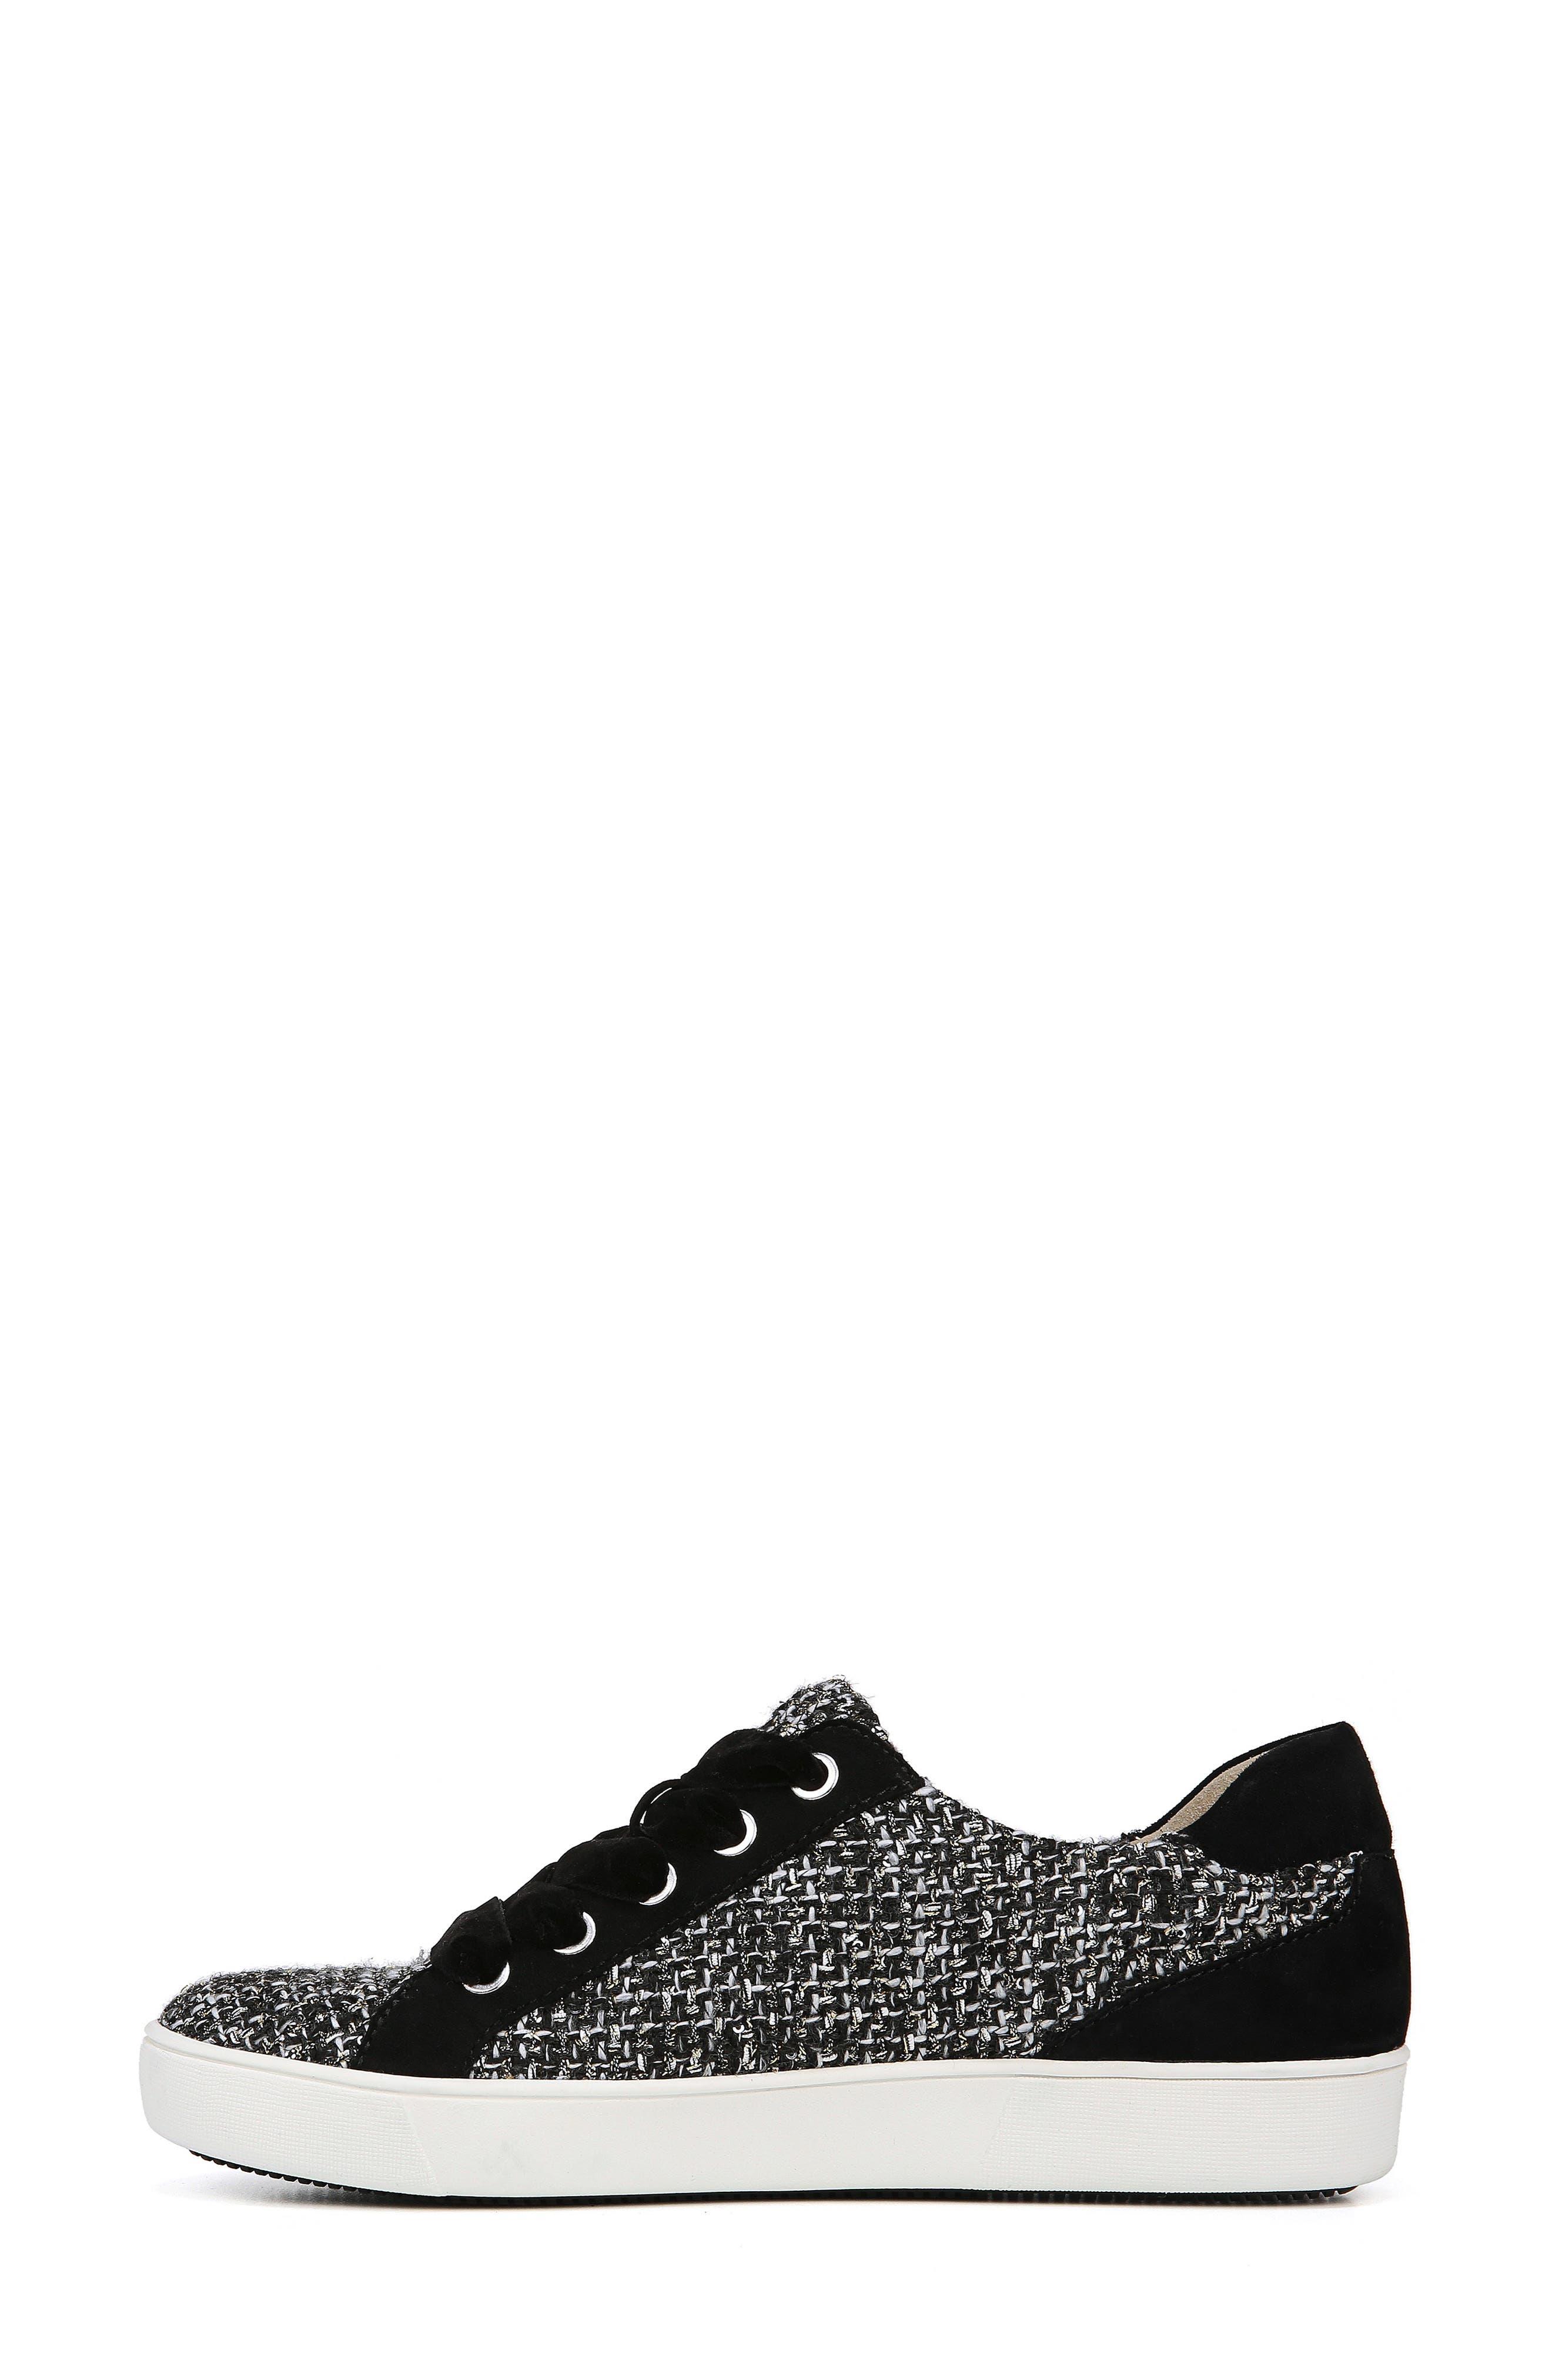 Morrison Sneaker,                             Alternate thumbnail 8, color,                             BLACK/ WHITE TWEED FABRIC